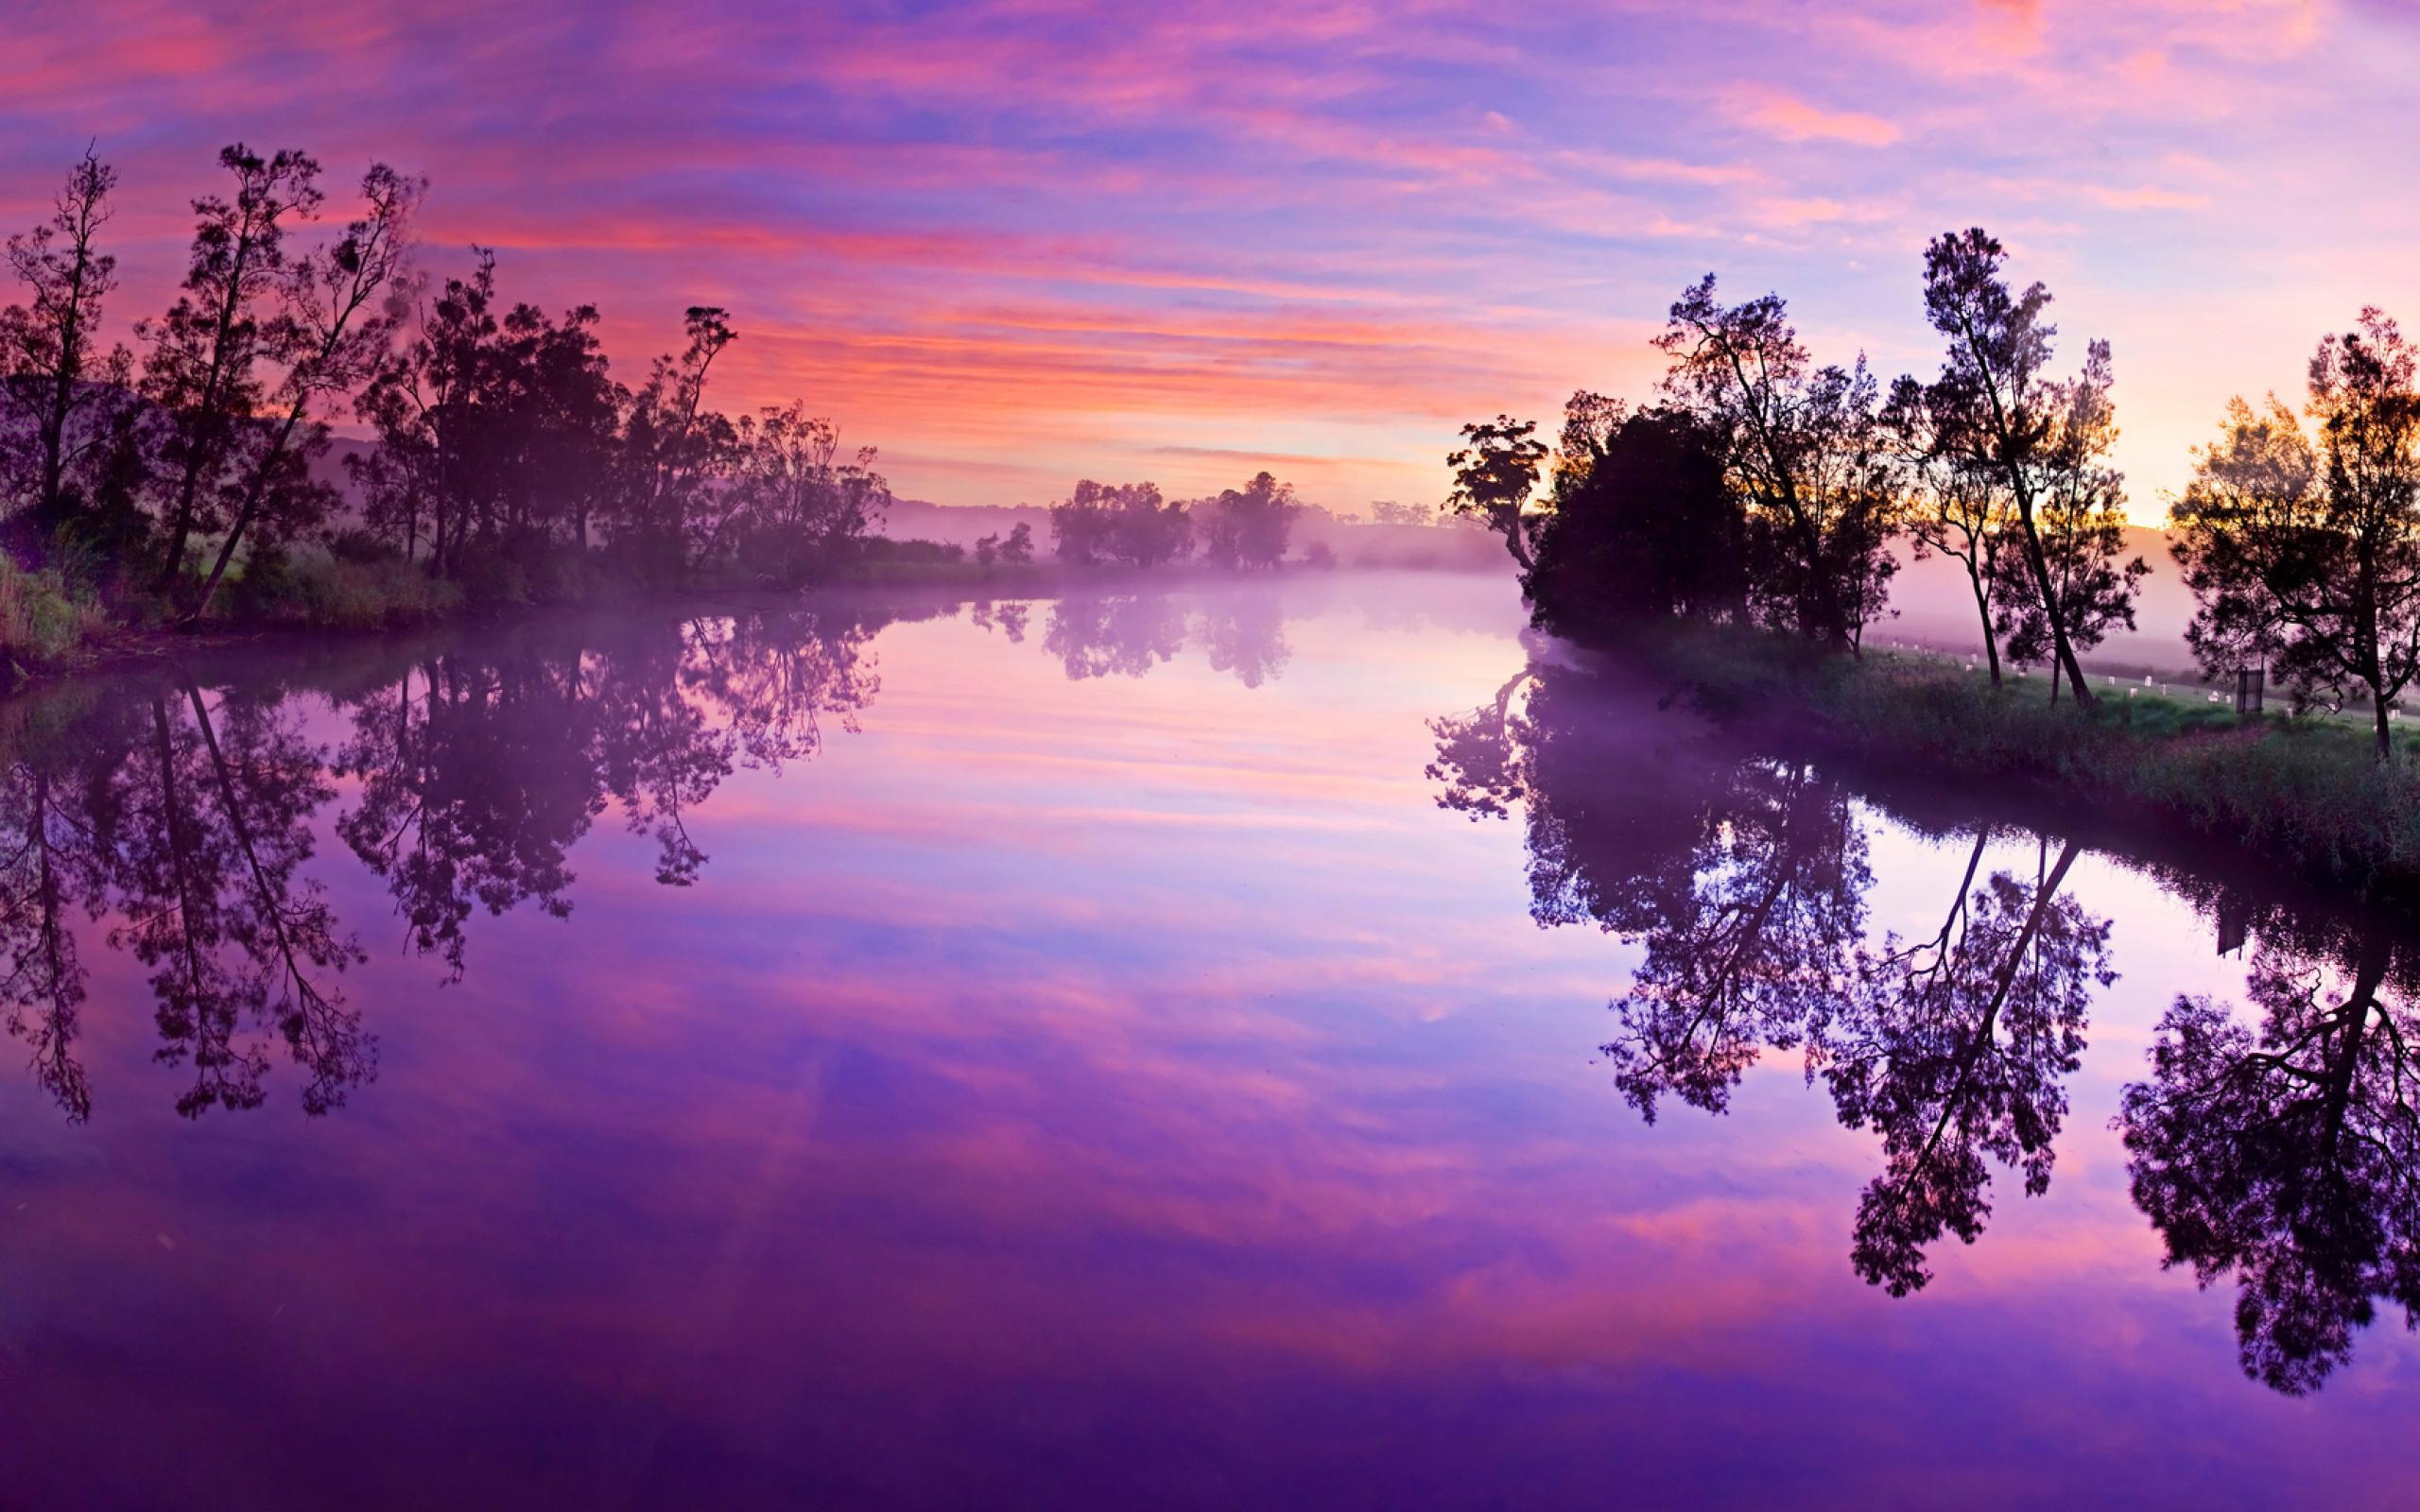 Purple Wallpaper Iphone HD 7052 Wallpaper Cool Walldiskpapercom 2560x1600